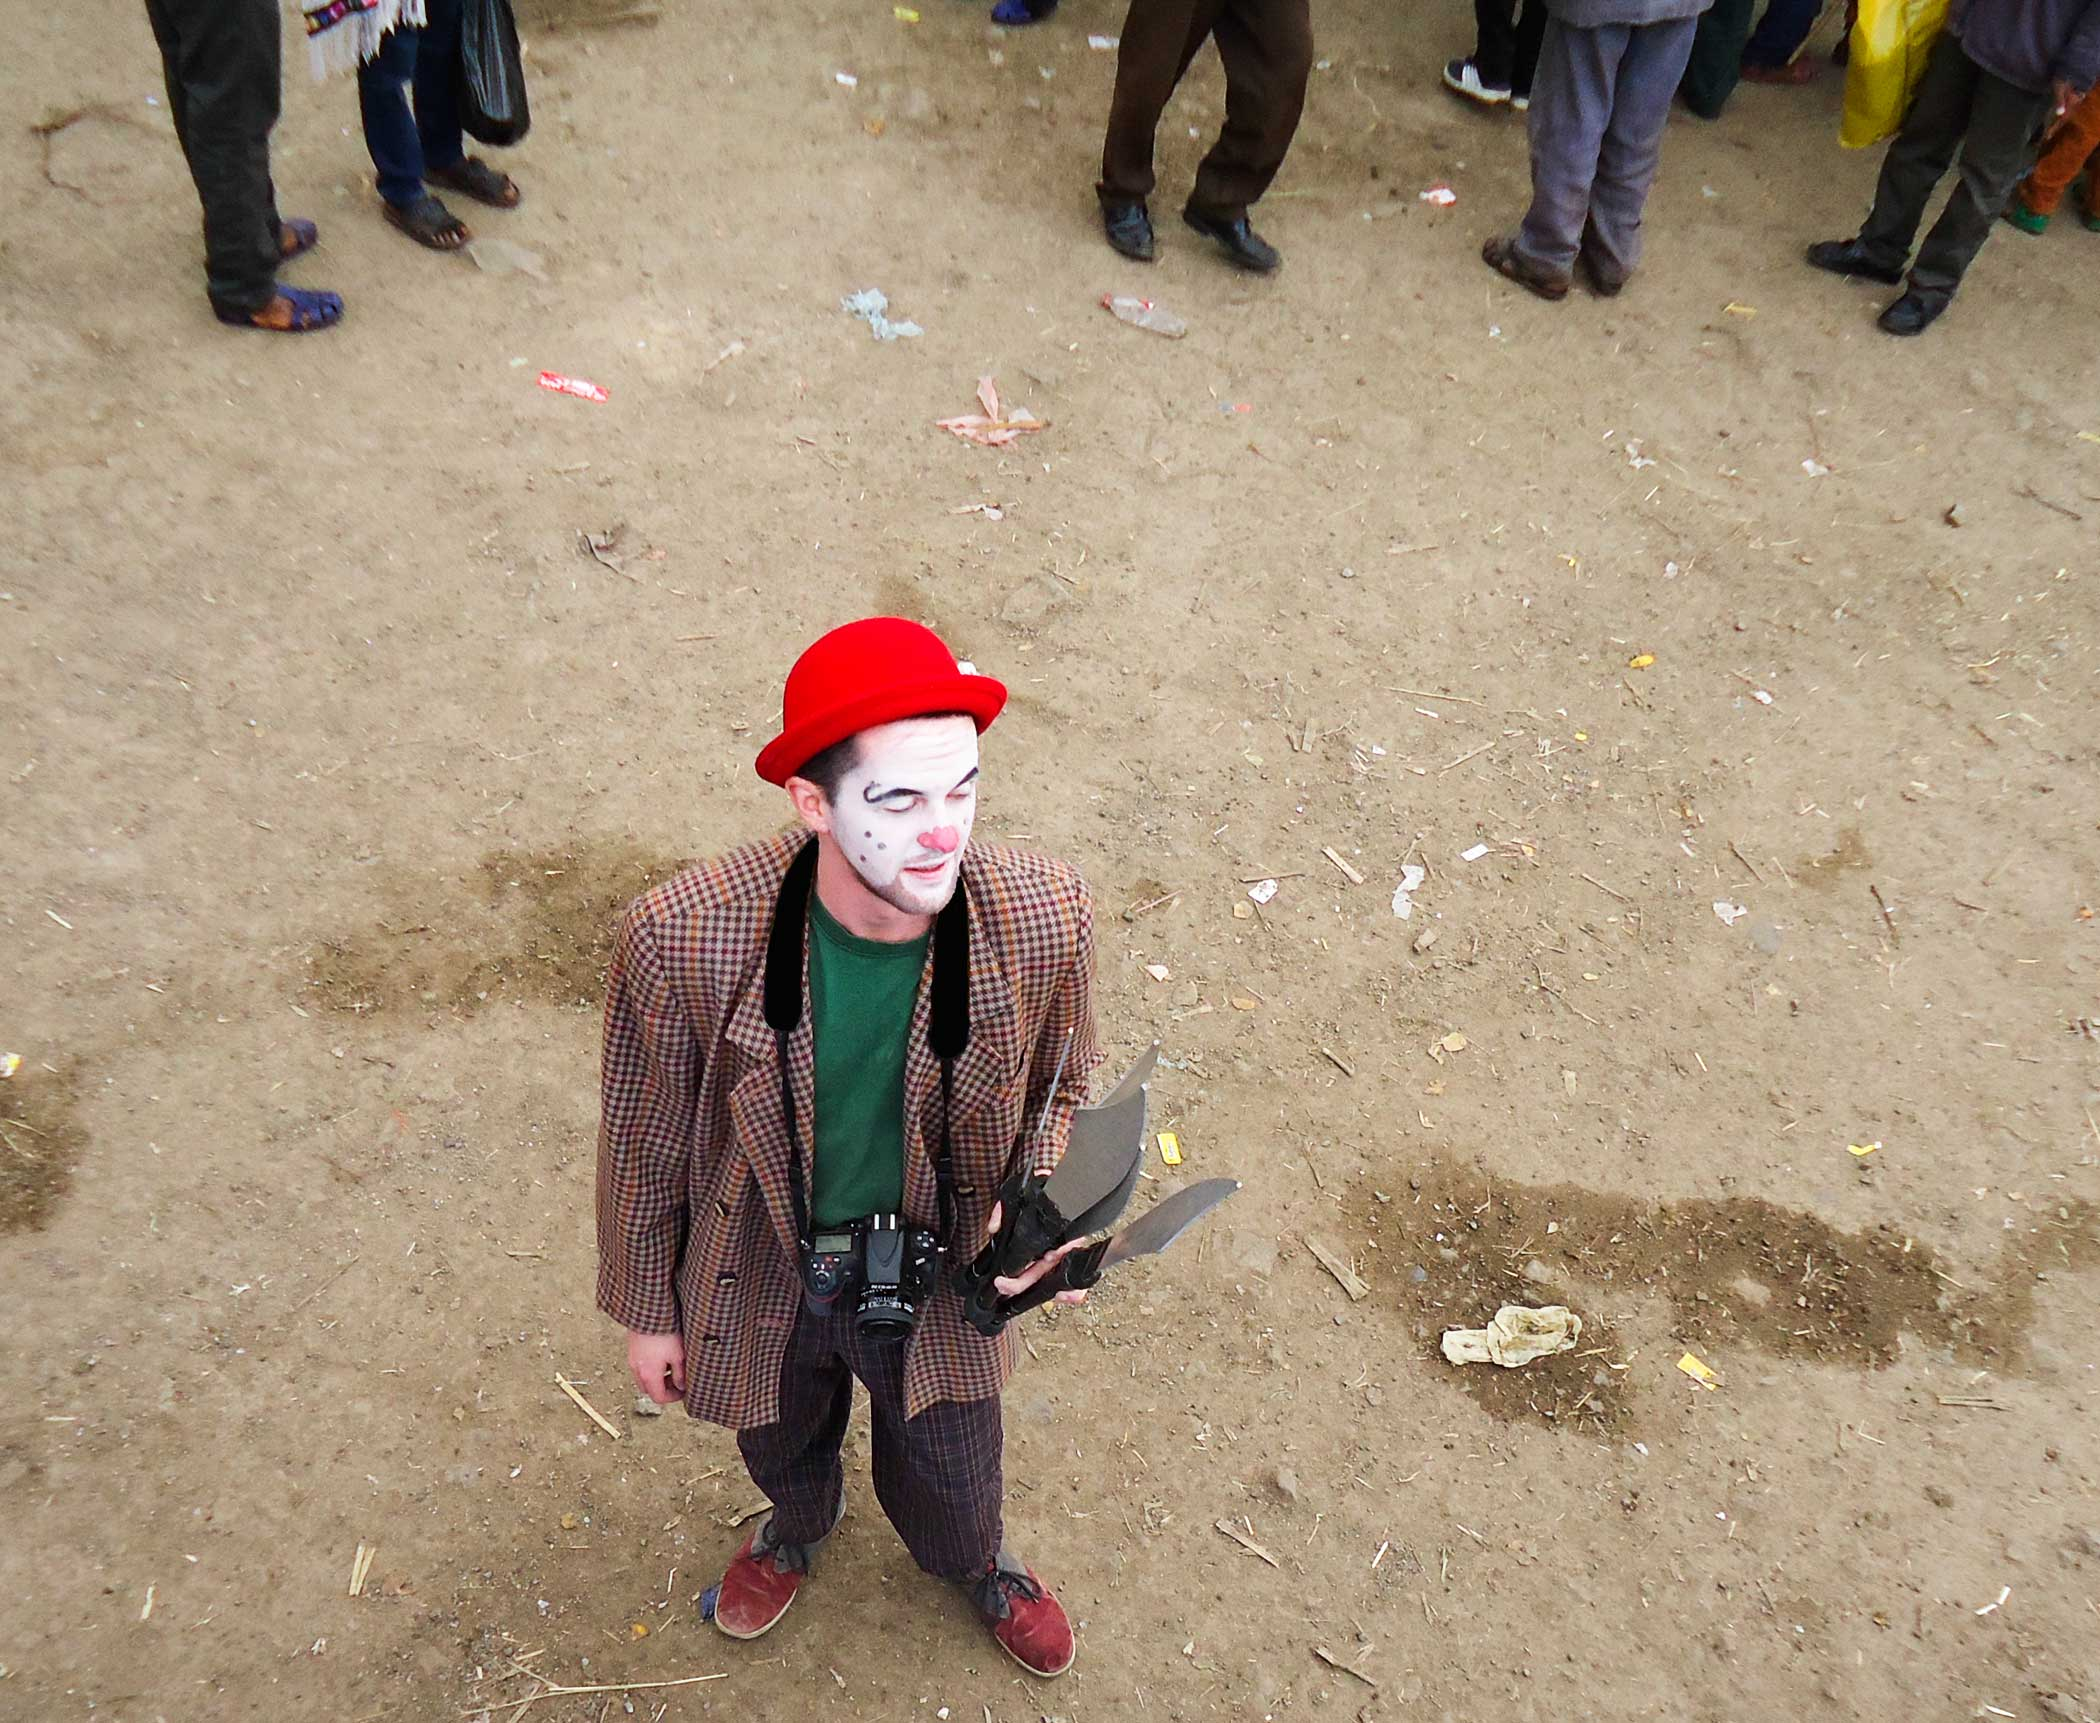 Lukas Berger dressed as a clown at the Circus Debere Berhan in Ethiopia.